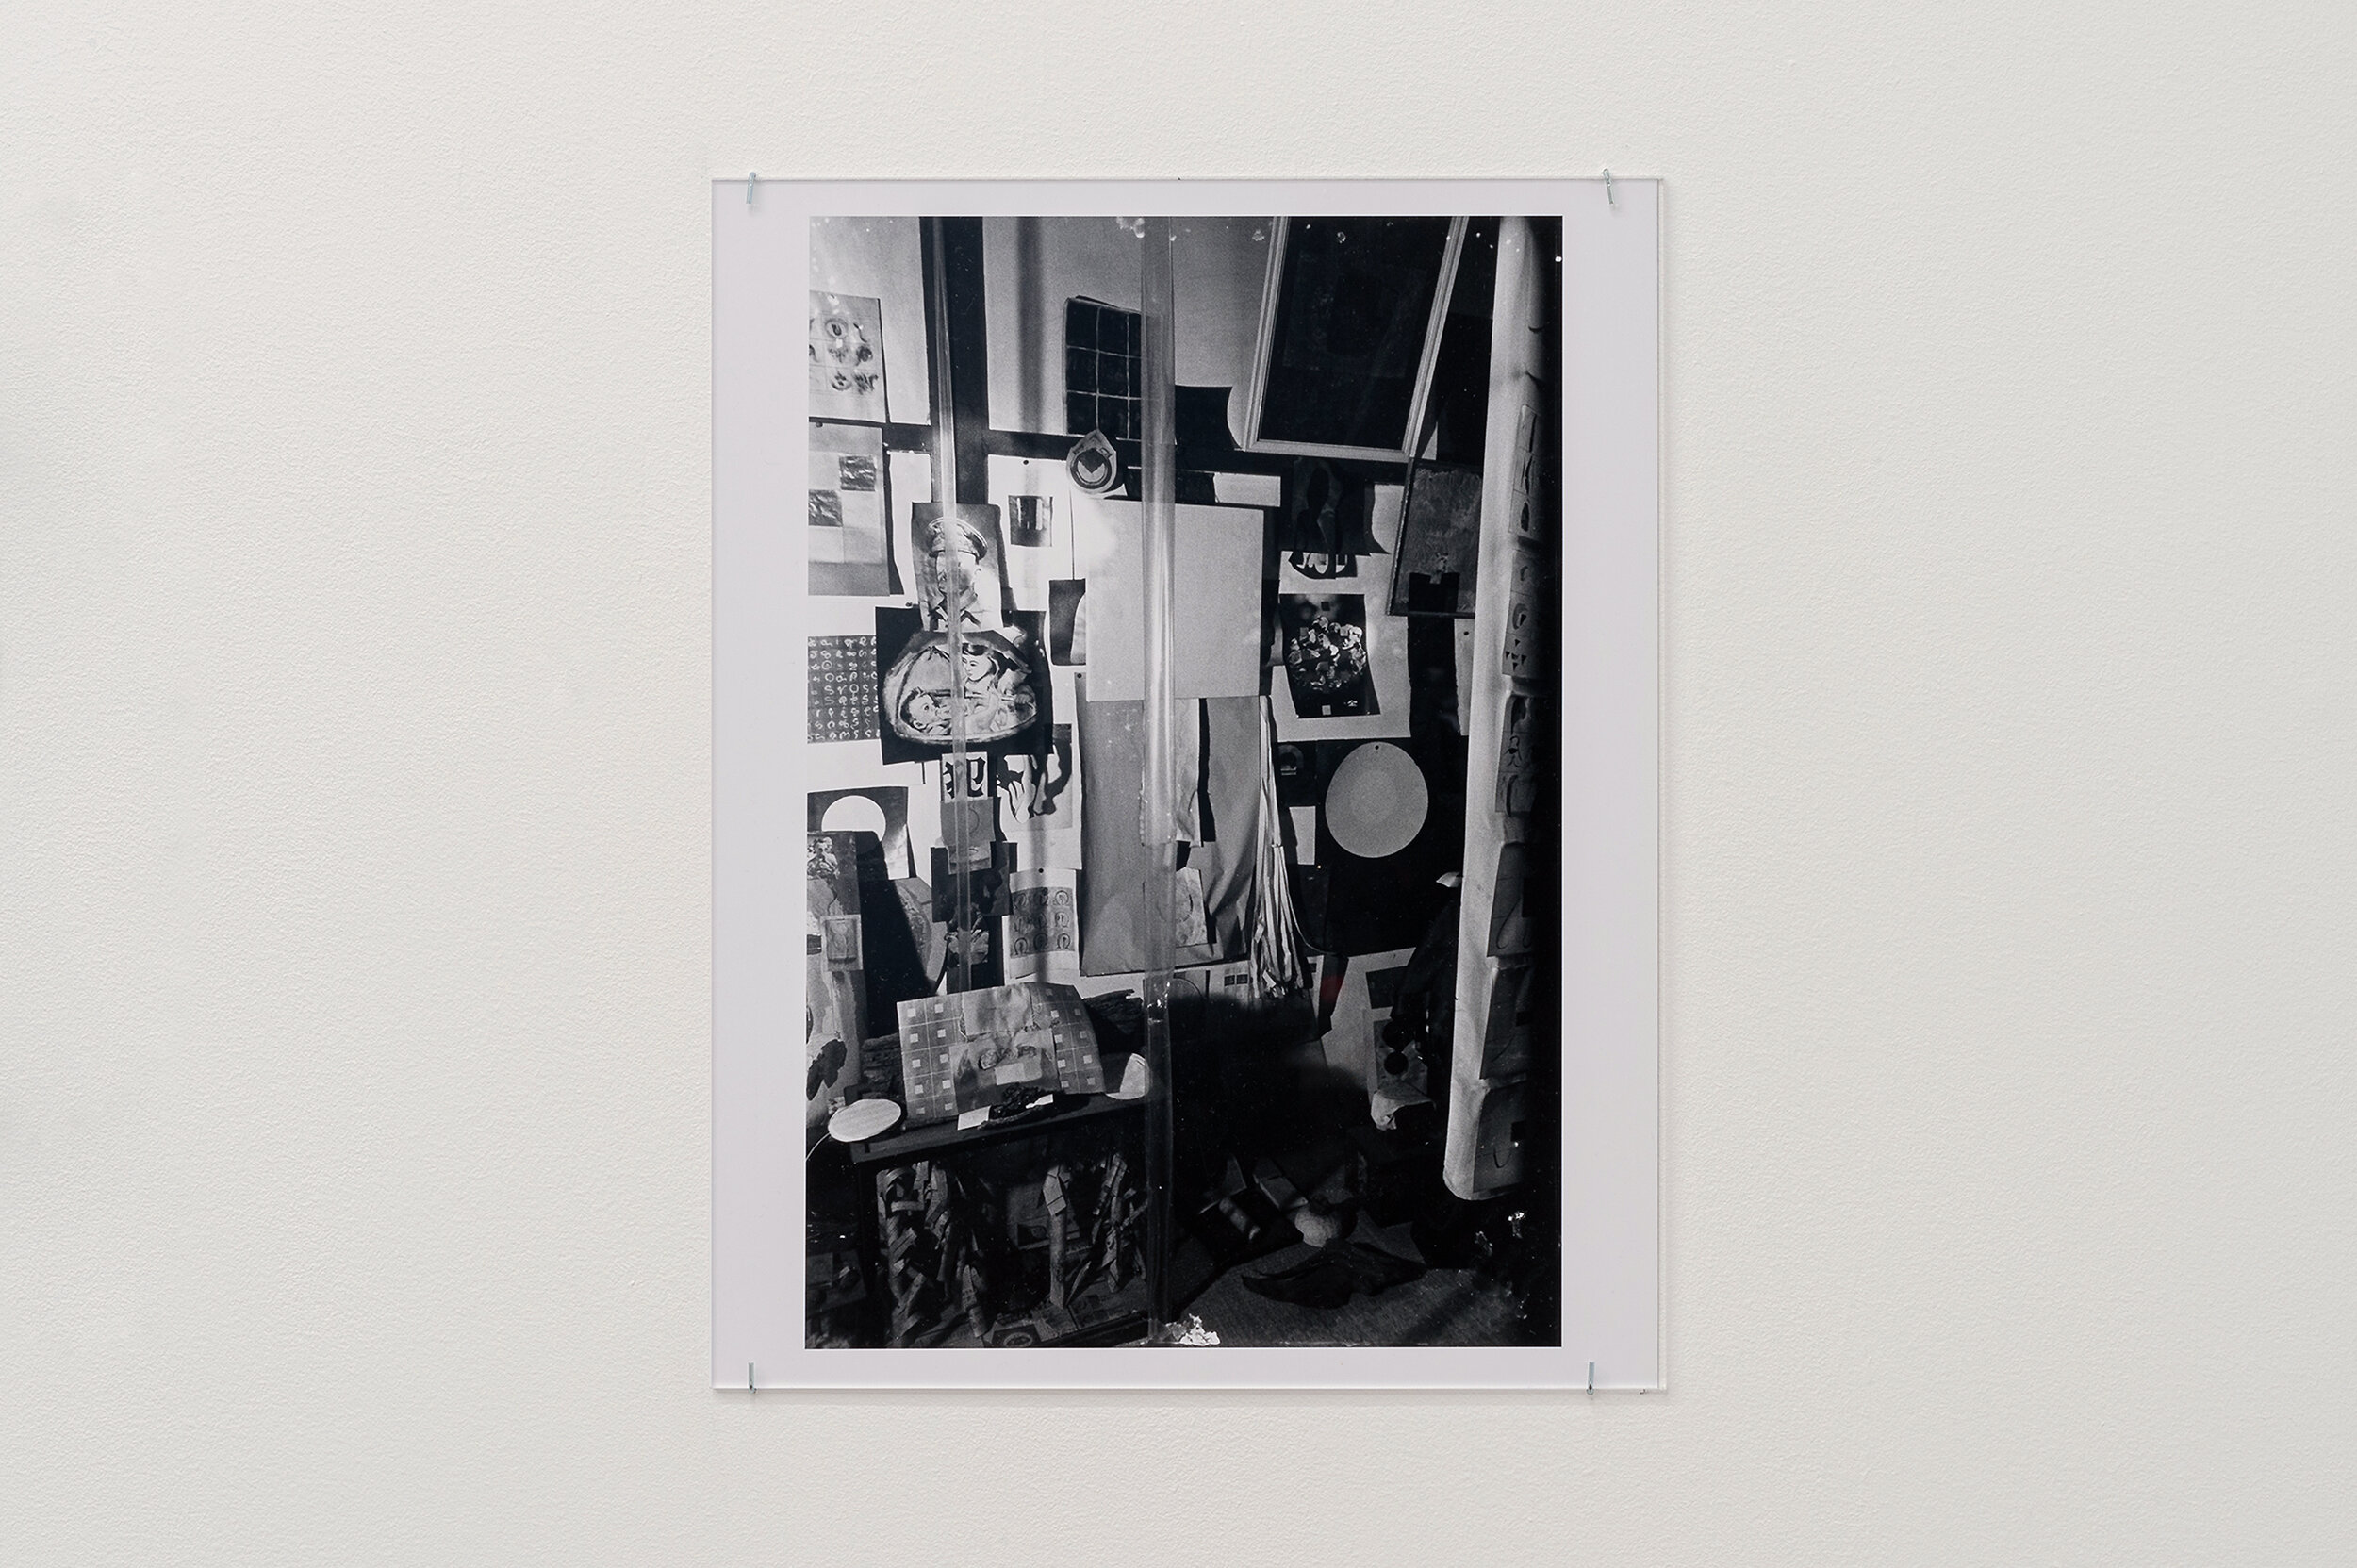 Psi Room, 1969